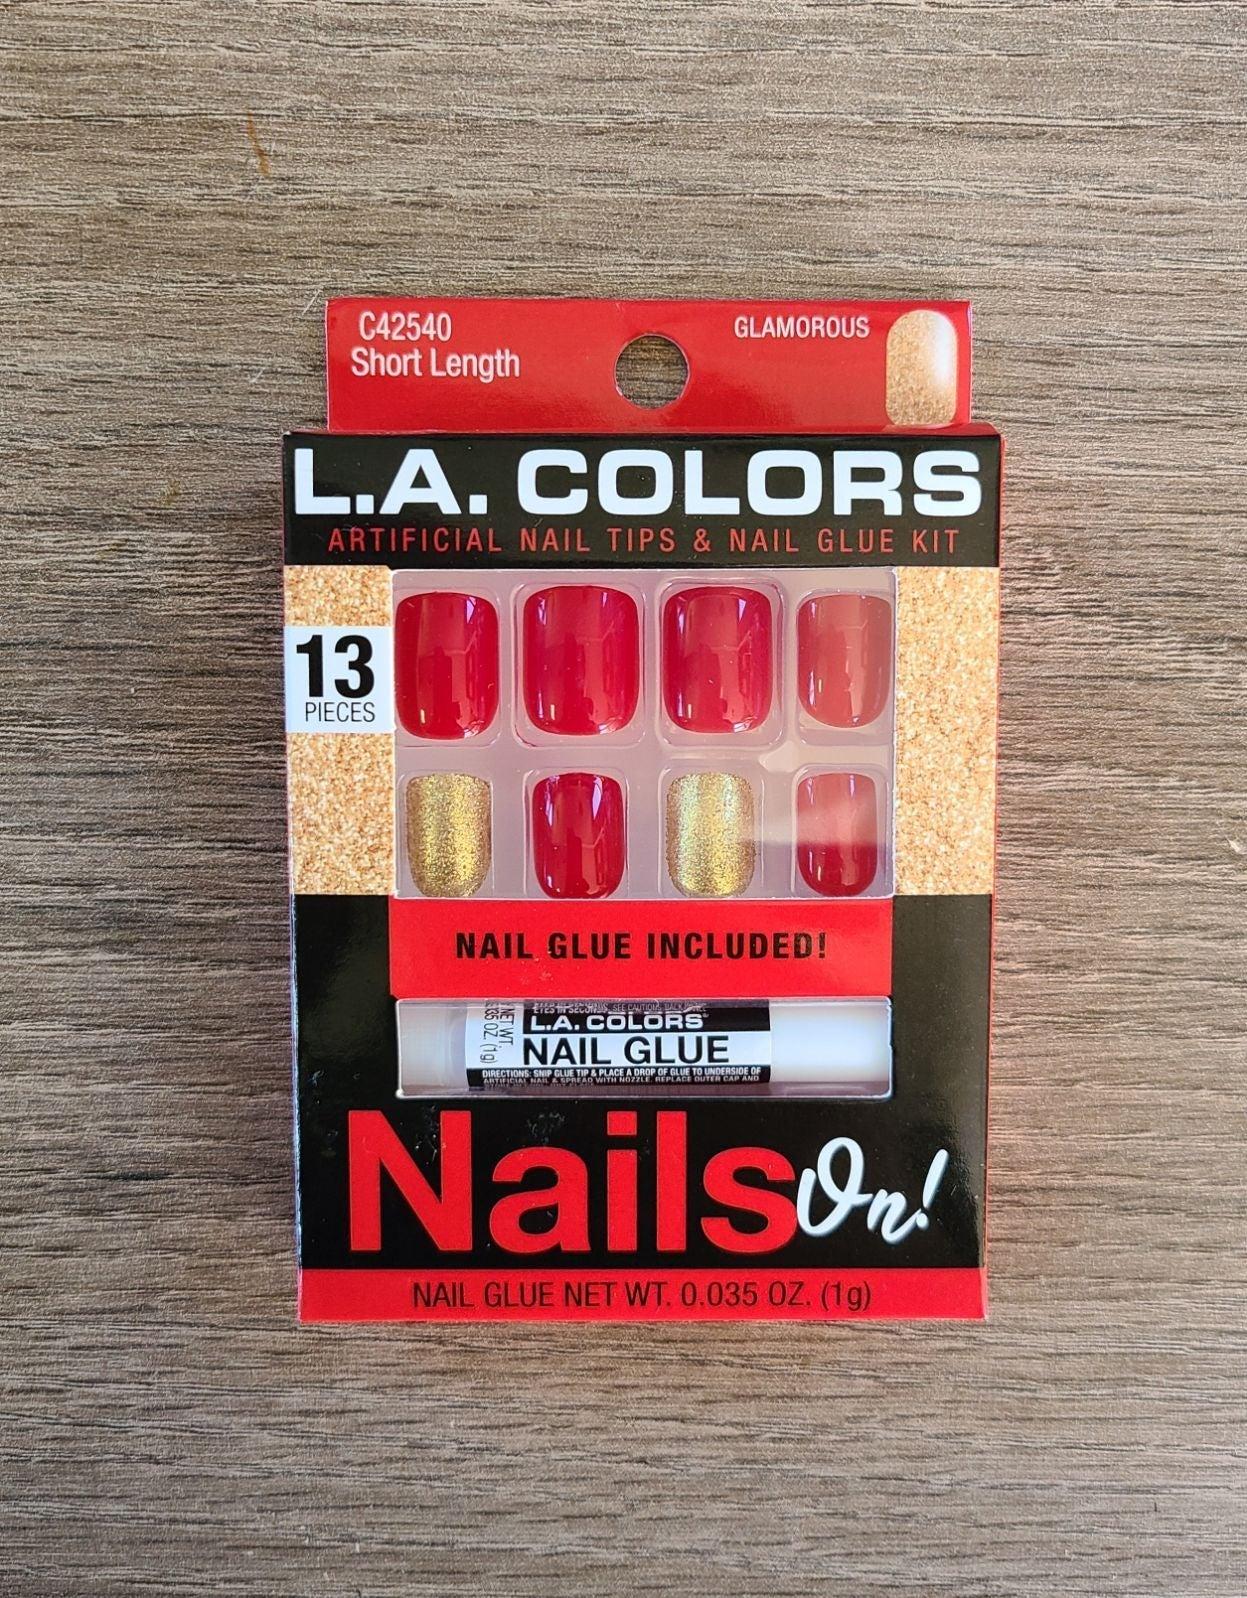 Fashion fake nails, falsies